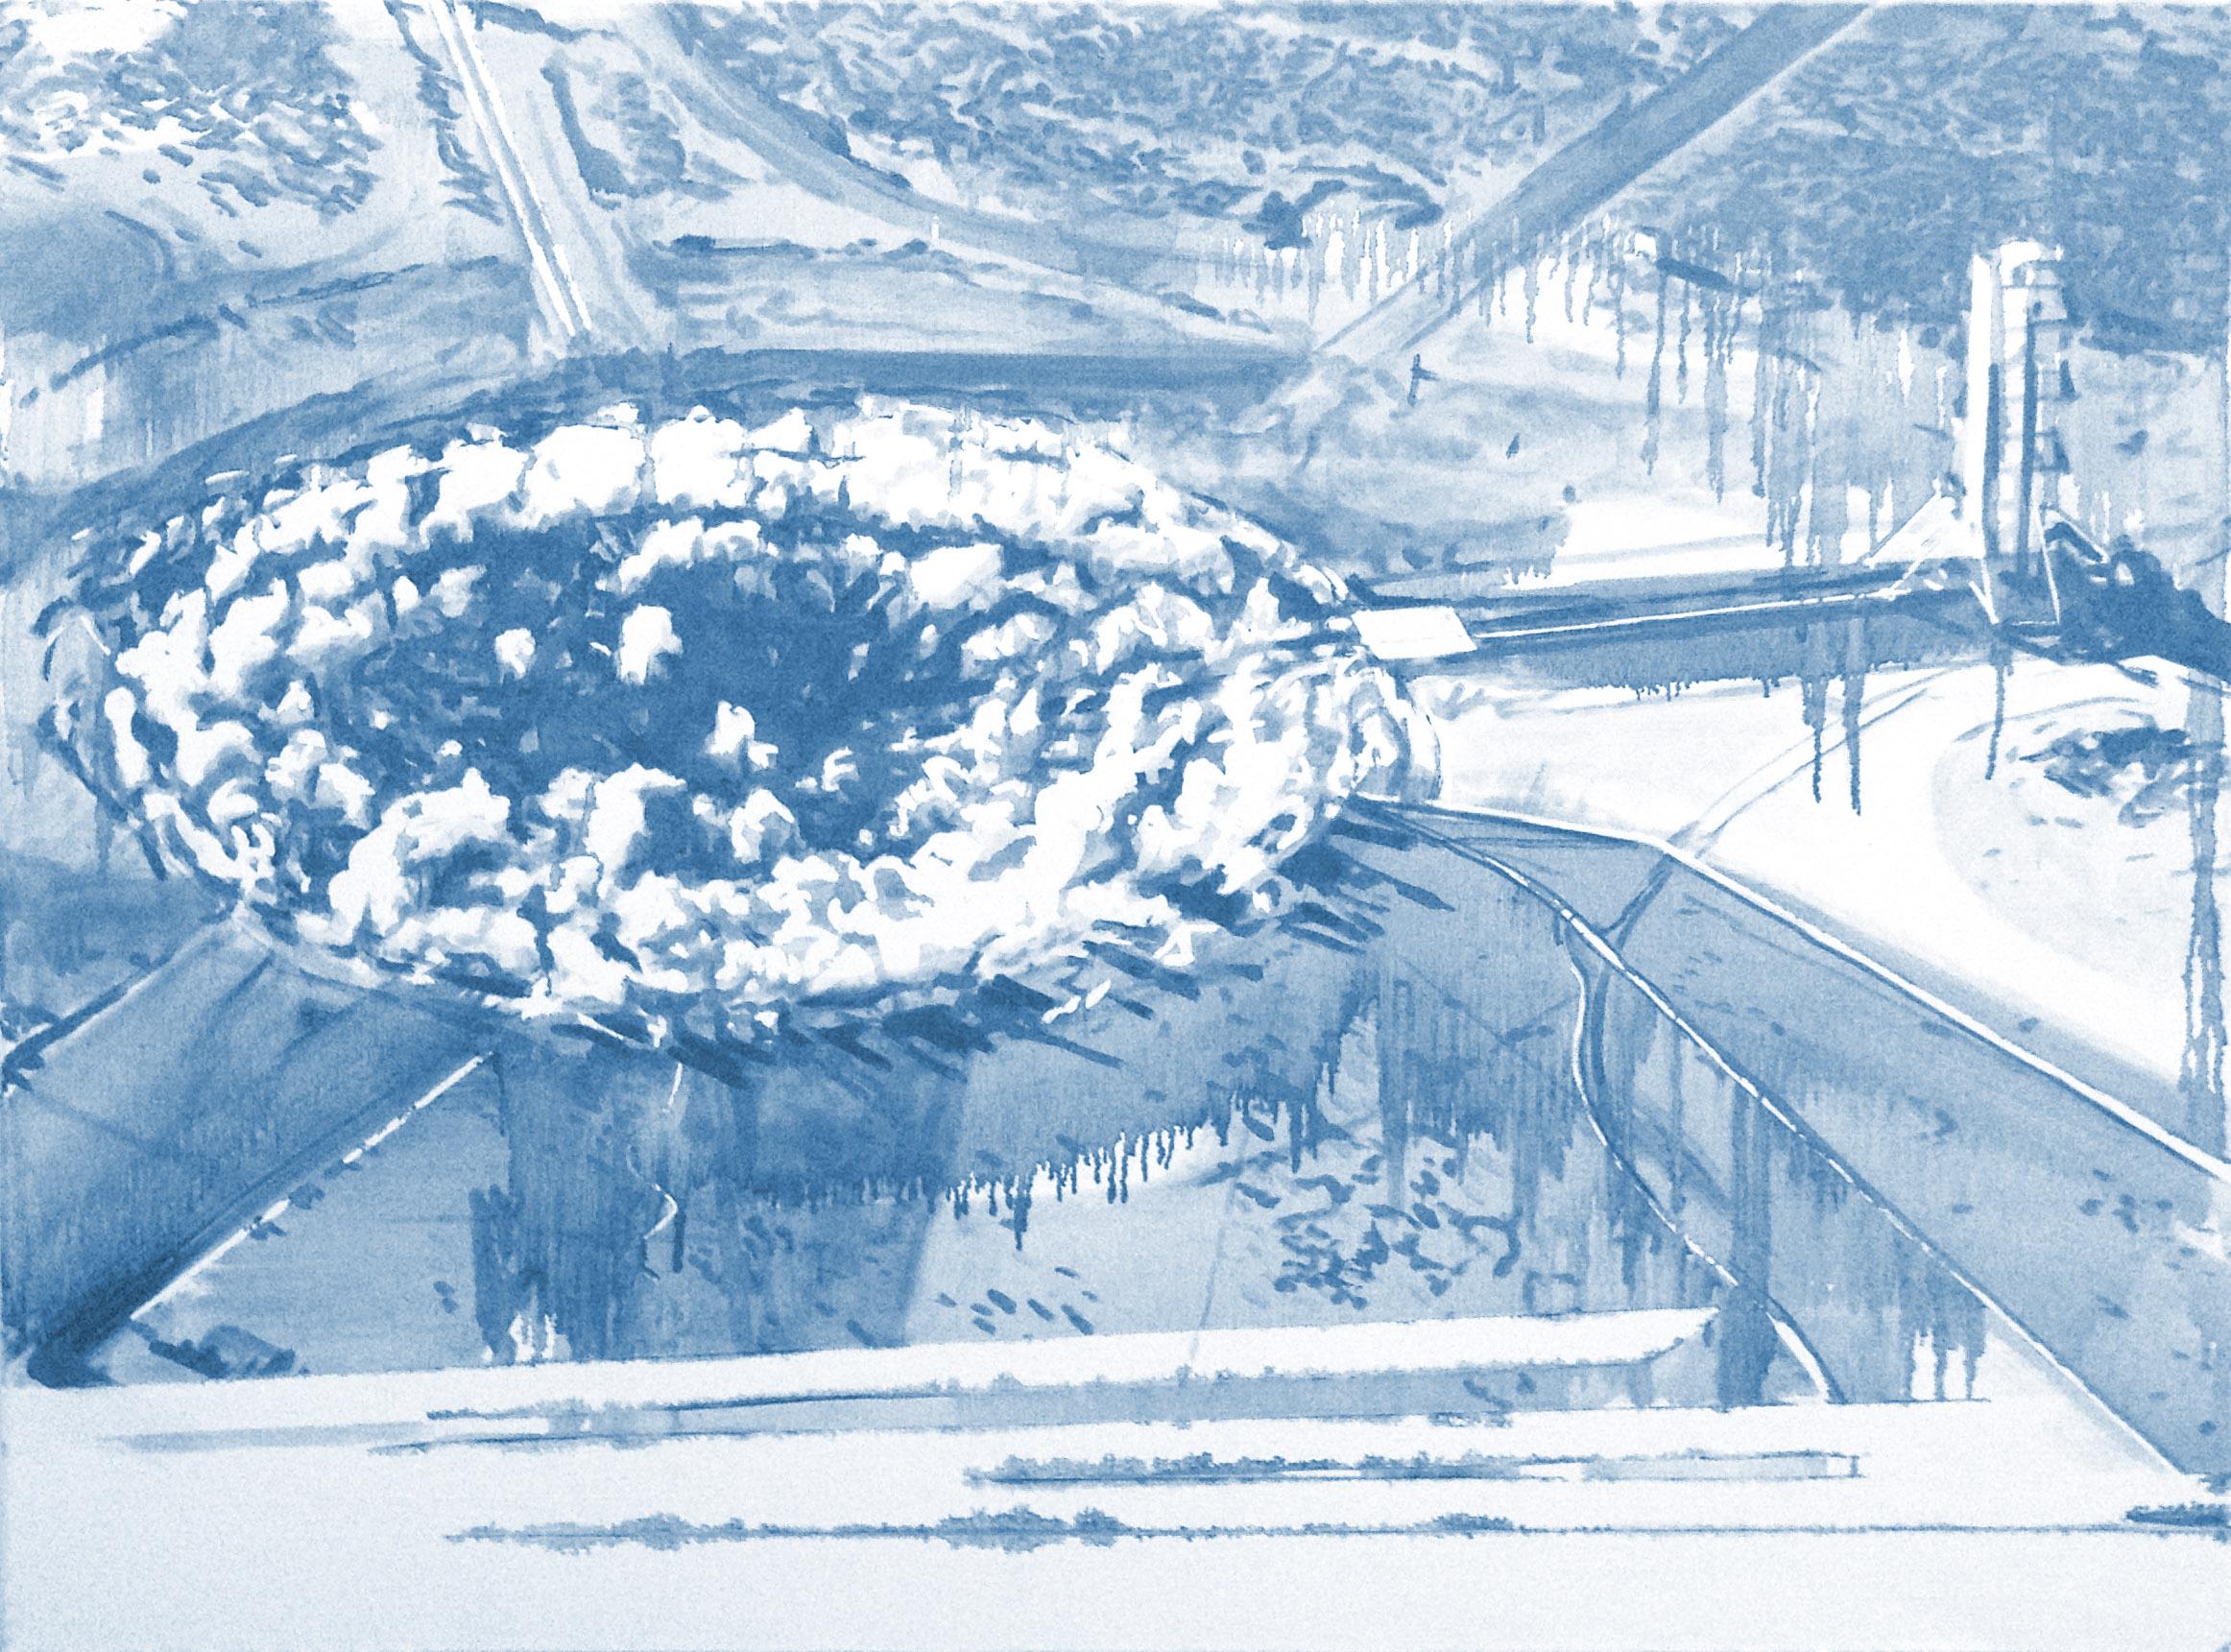 "Underground Nuclear Test, Nevada, Oil on linen, 40x30"", 2014."